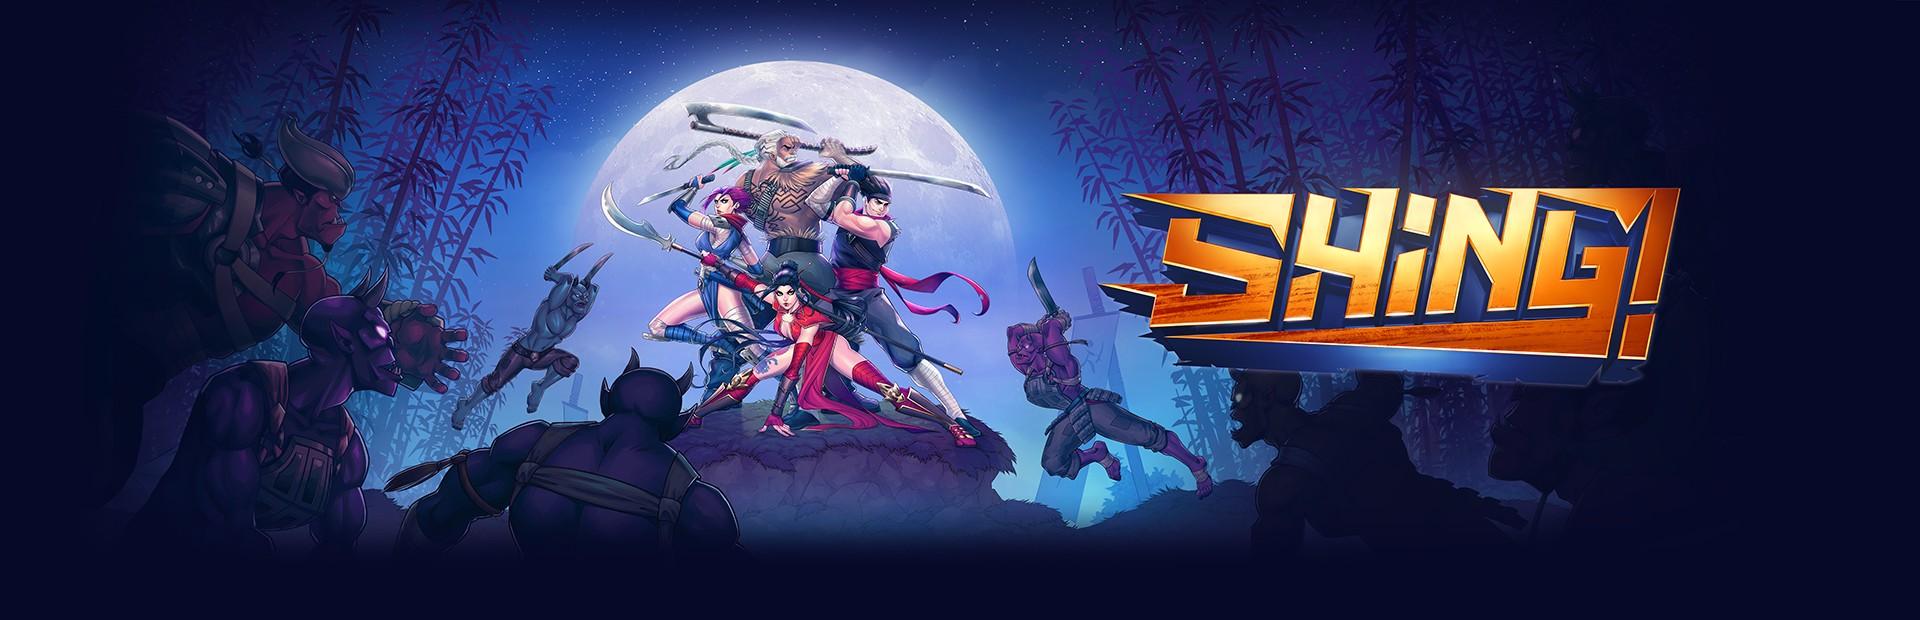 IGN游戏之夏:清版动作游戏《Shing》玩法演示 Q3发售